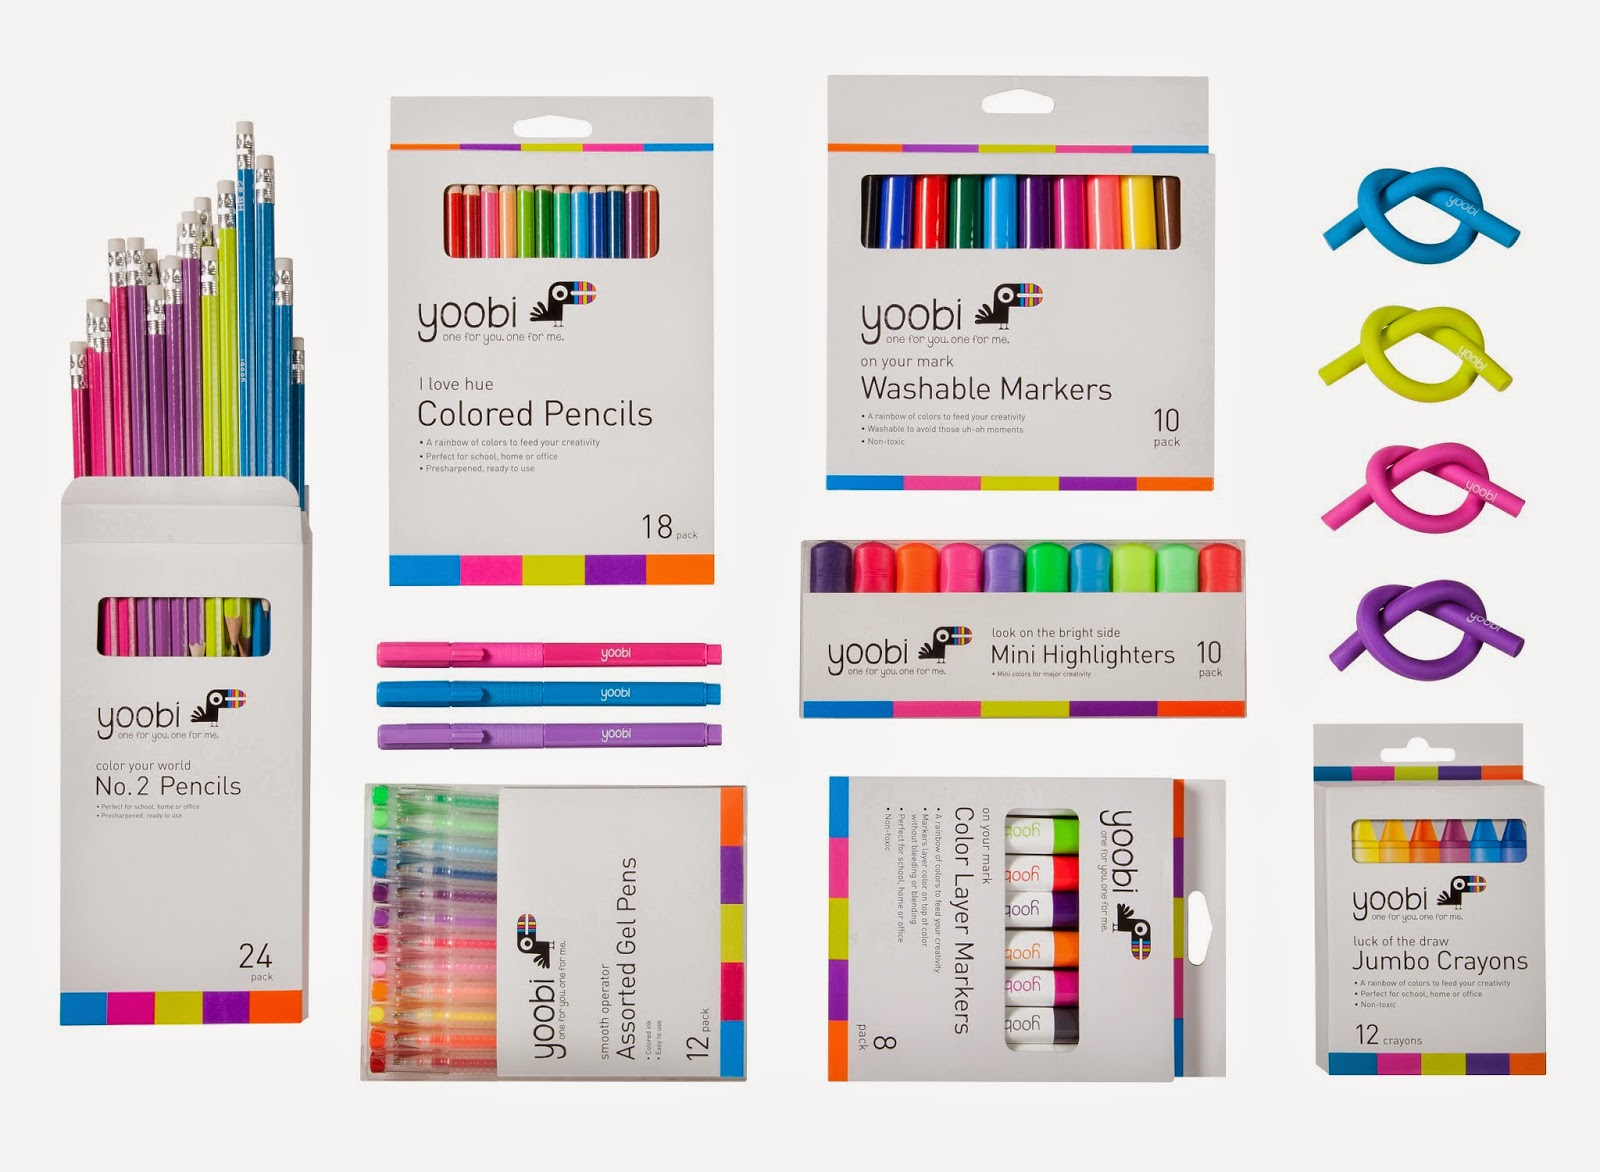 Insnug Kids Desk Organizer School Supplies Makeup brush Supply Pencils Caddy for Kids and Adults Office Cute Rainbow Cloud Wooden Pencil Holder Desk Accesories Decor for Phone Art Supplies